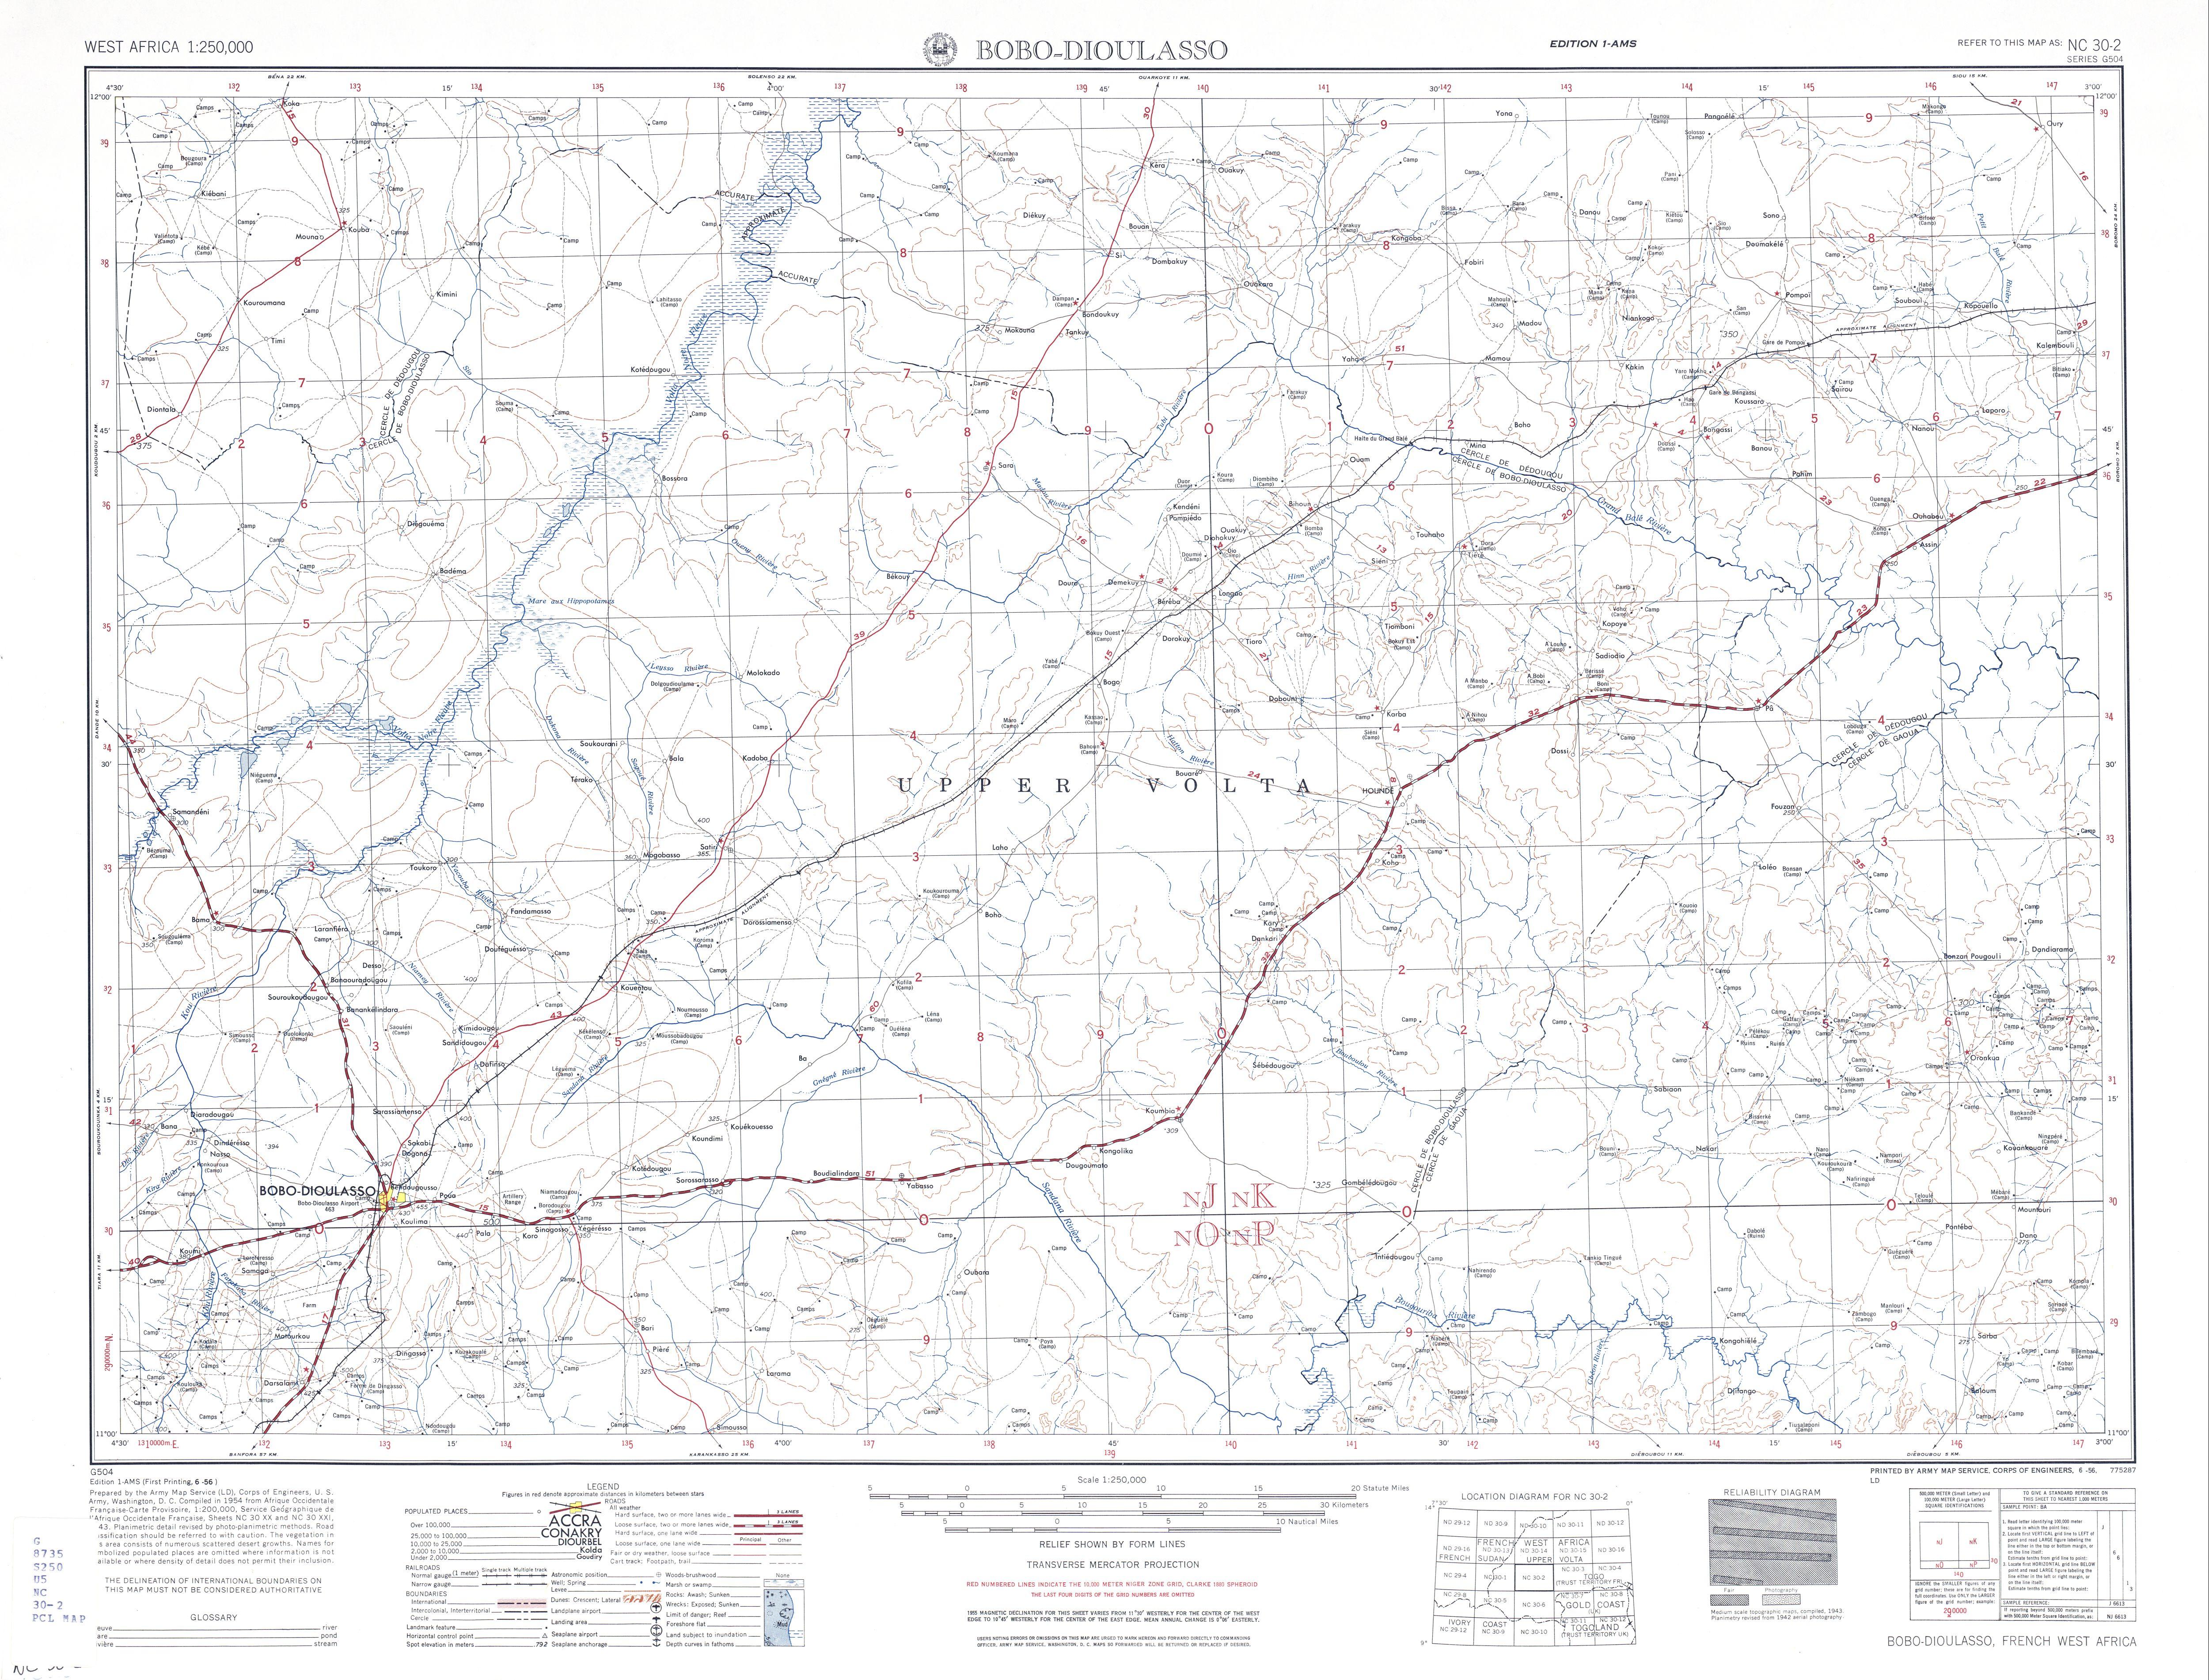 Hoja Bobo - Dioulasso del Mapa Topográfico de África Occidental 1955